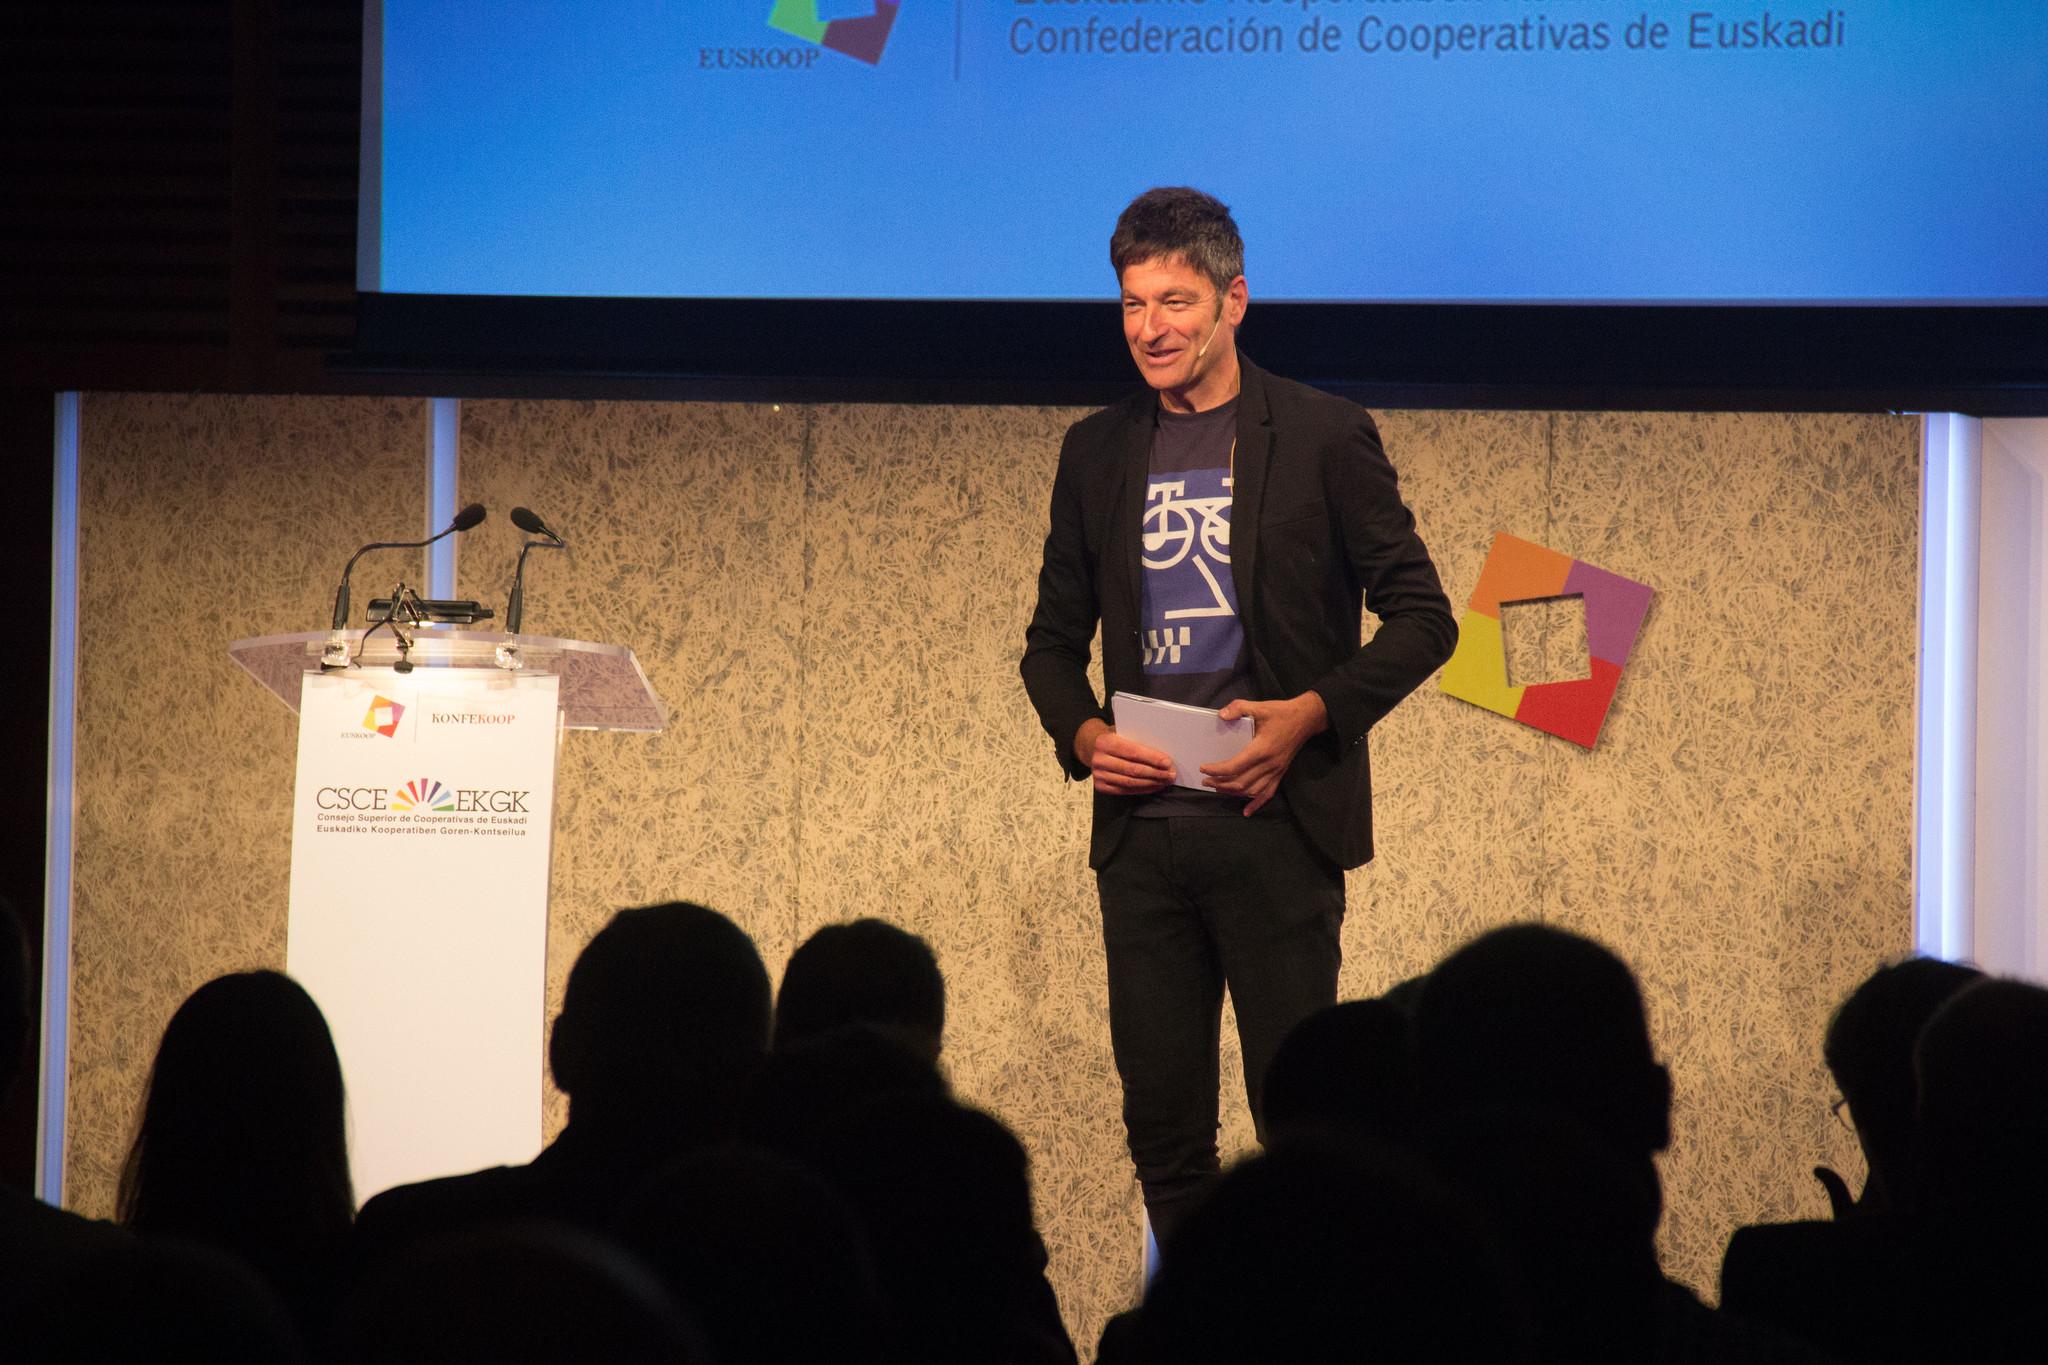 Premios 'Denon Artean' del cooperativismo vasco